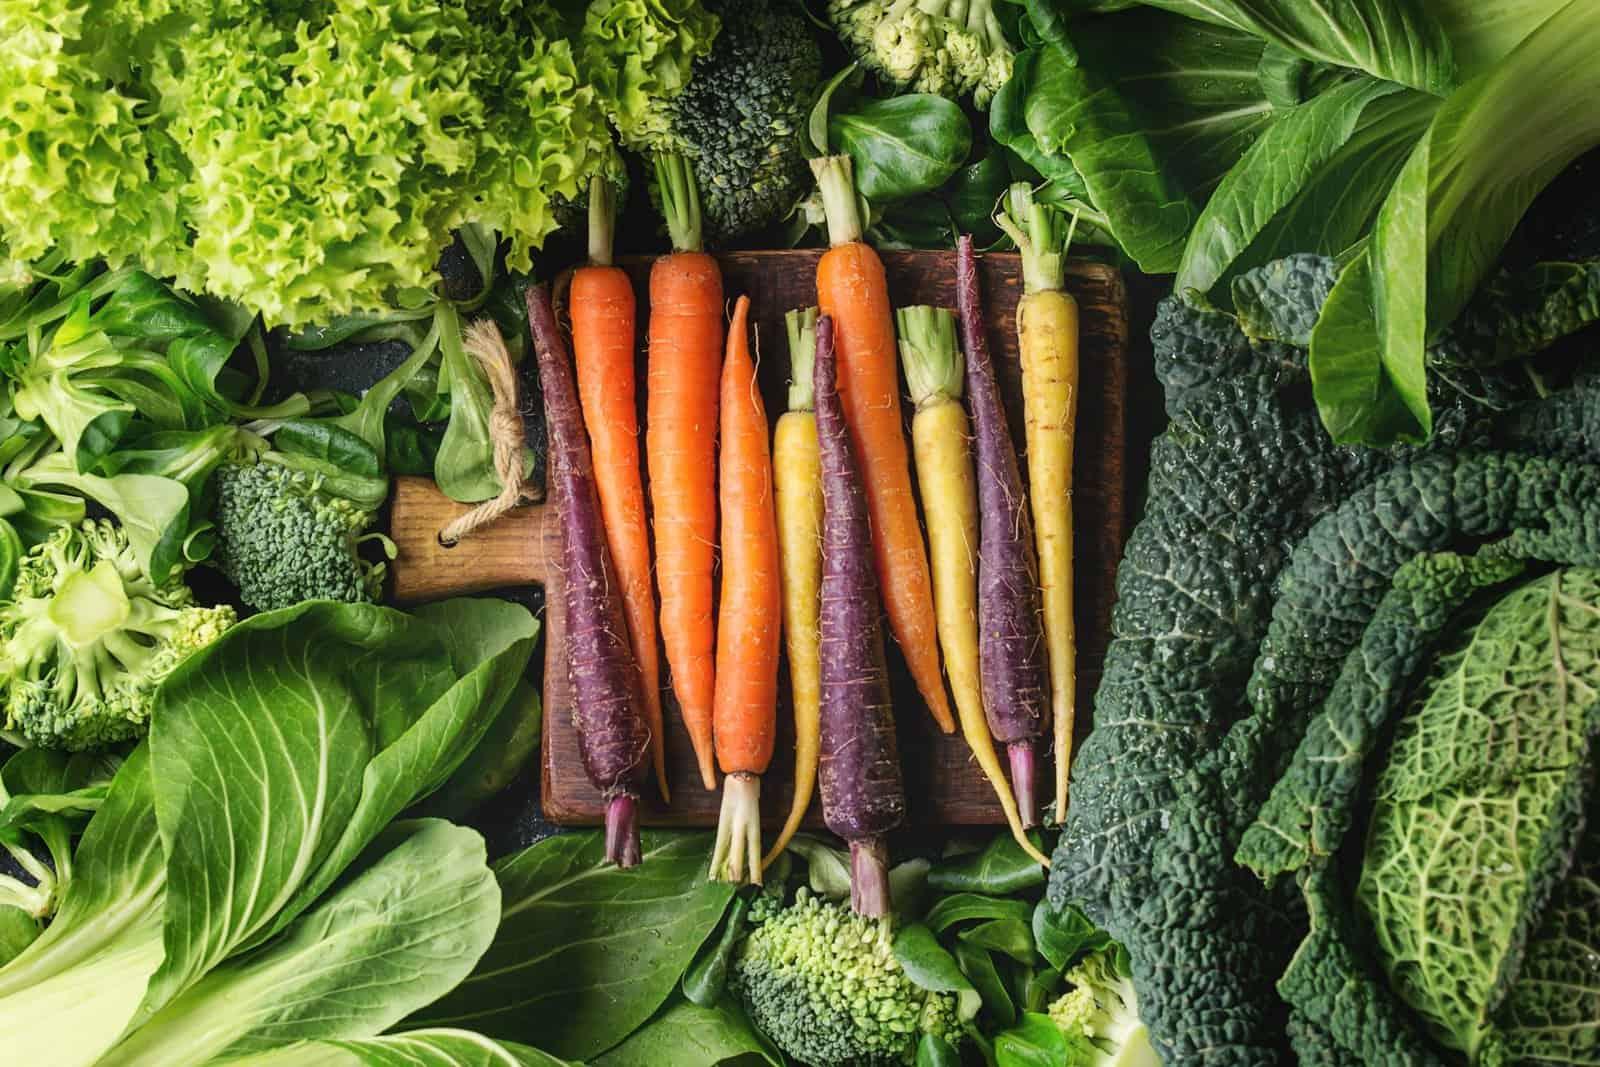 Amazing Advantages of Hyperlocal Food Movement